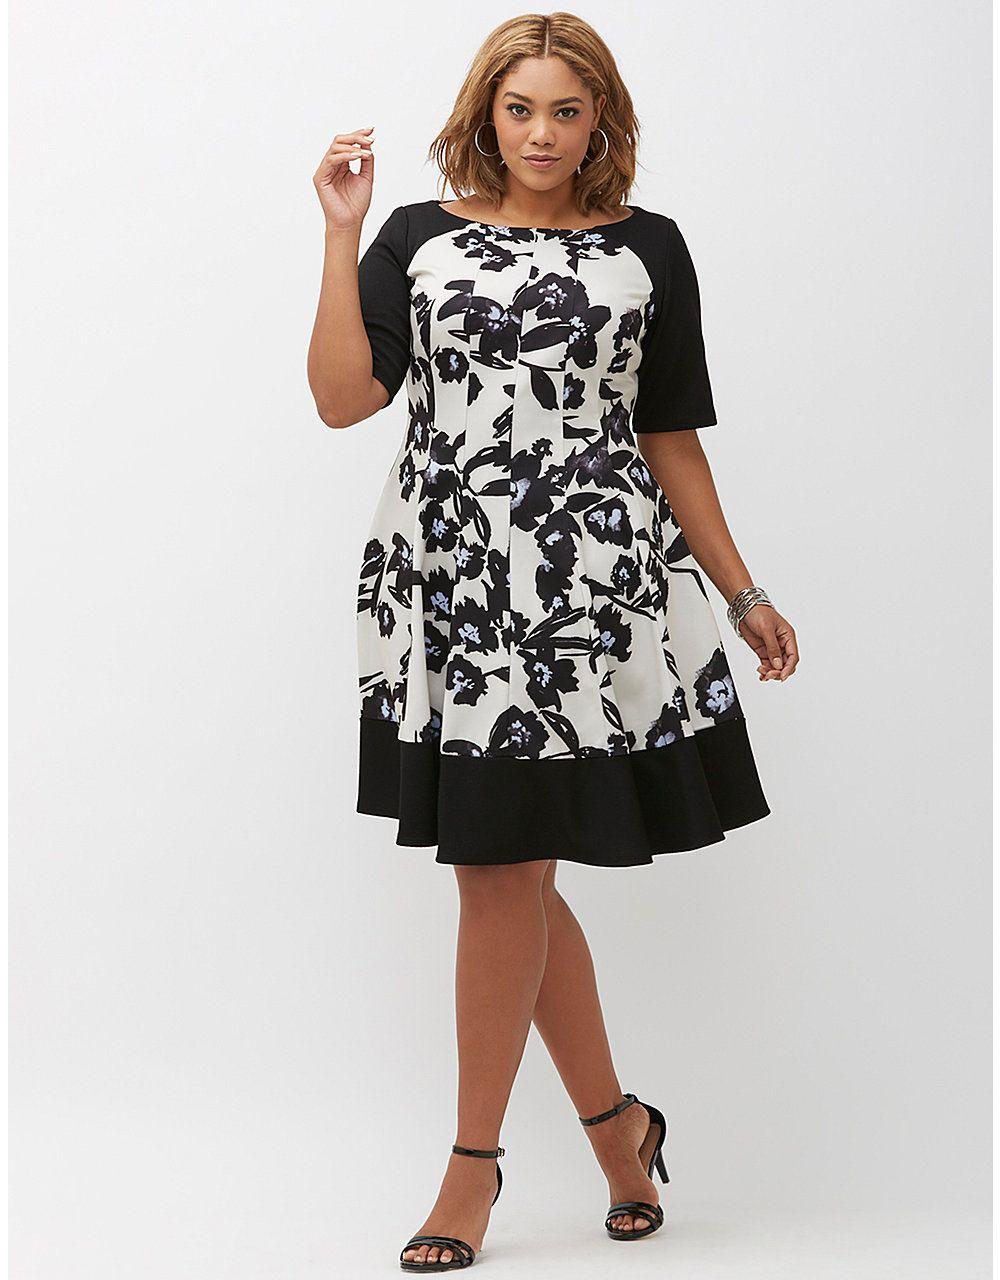 Floral Print Dress by Gabby Skye  72c968debd9e